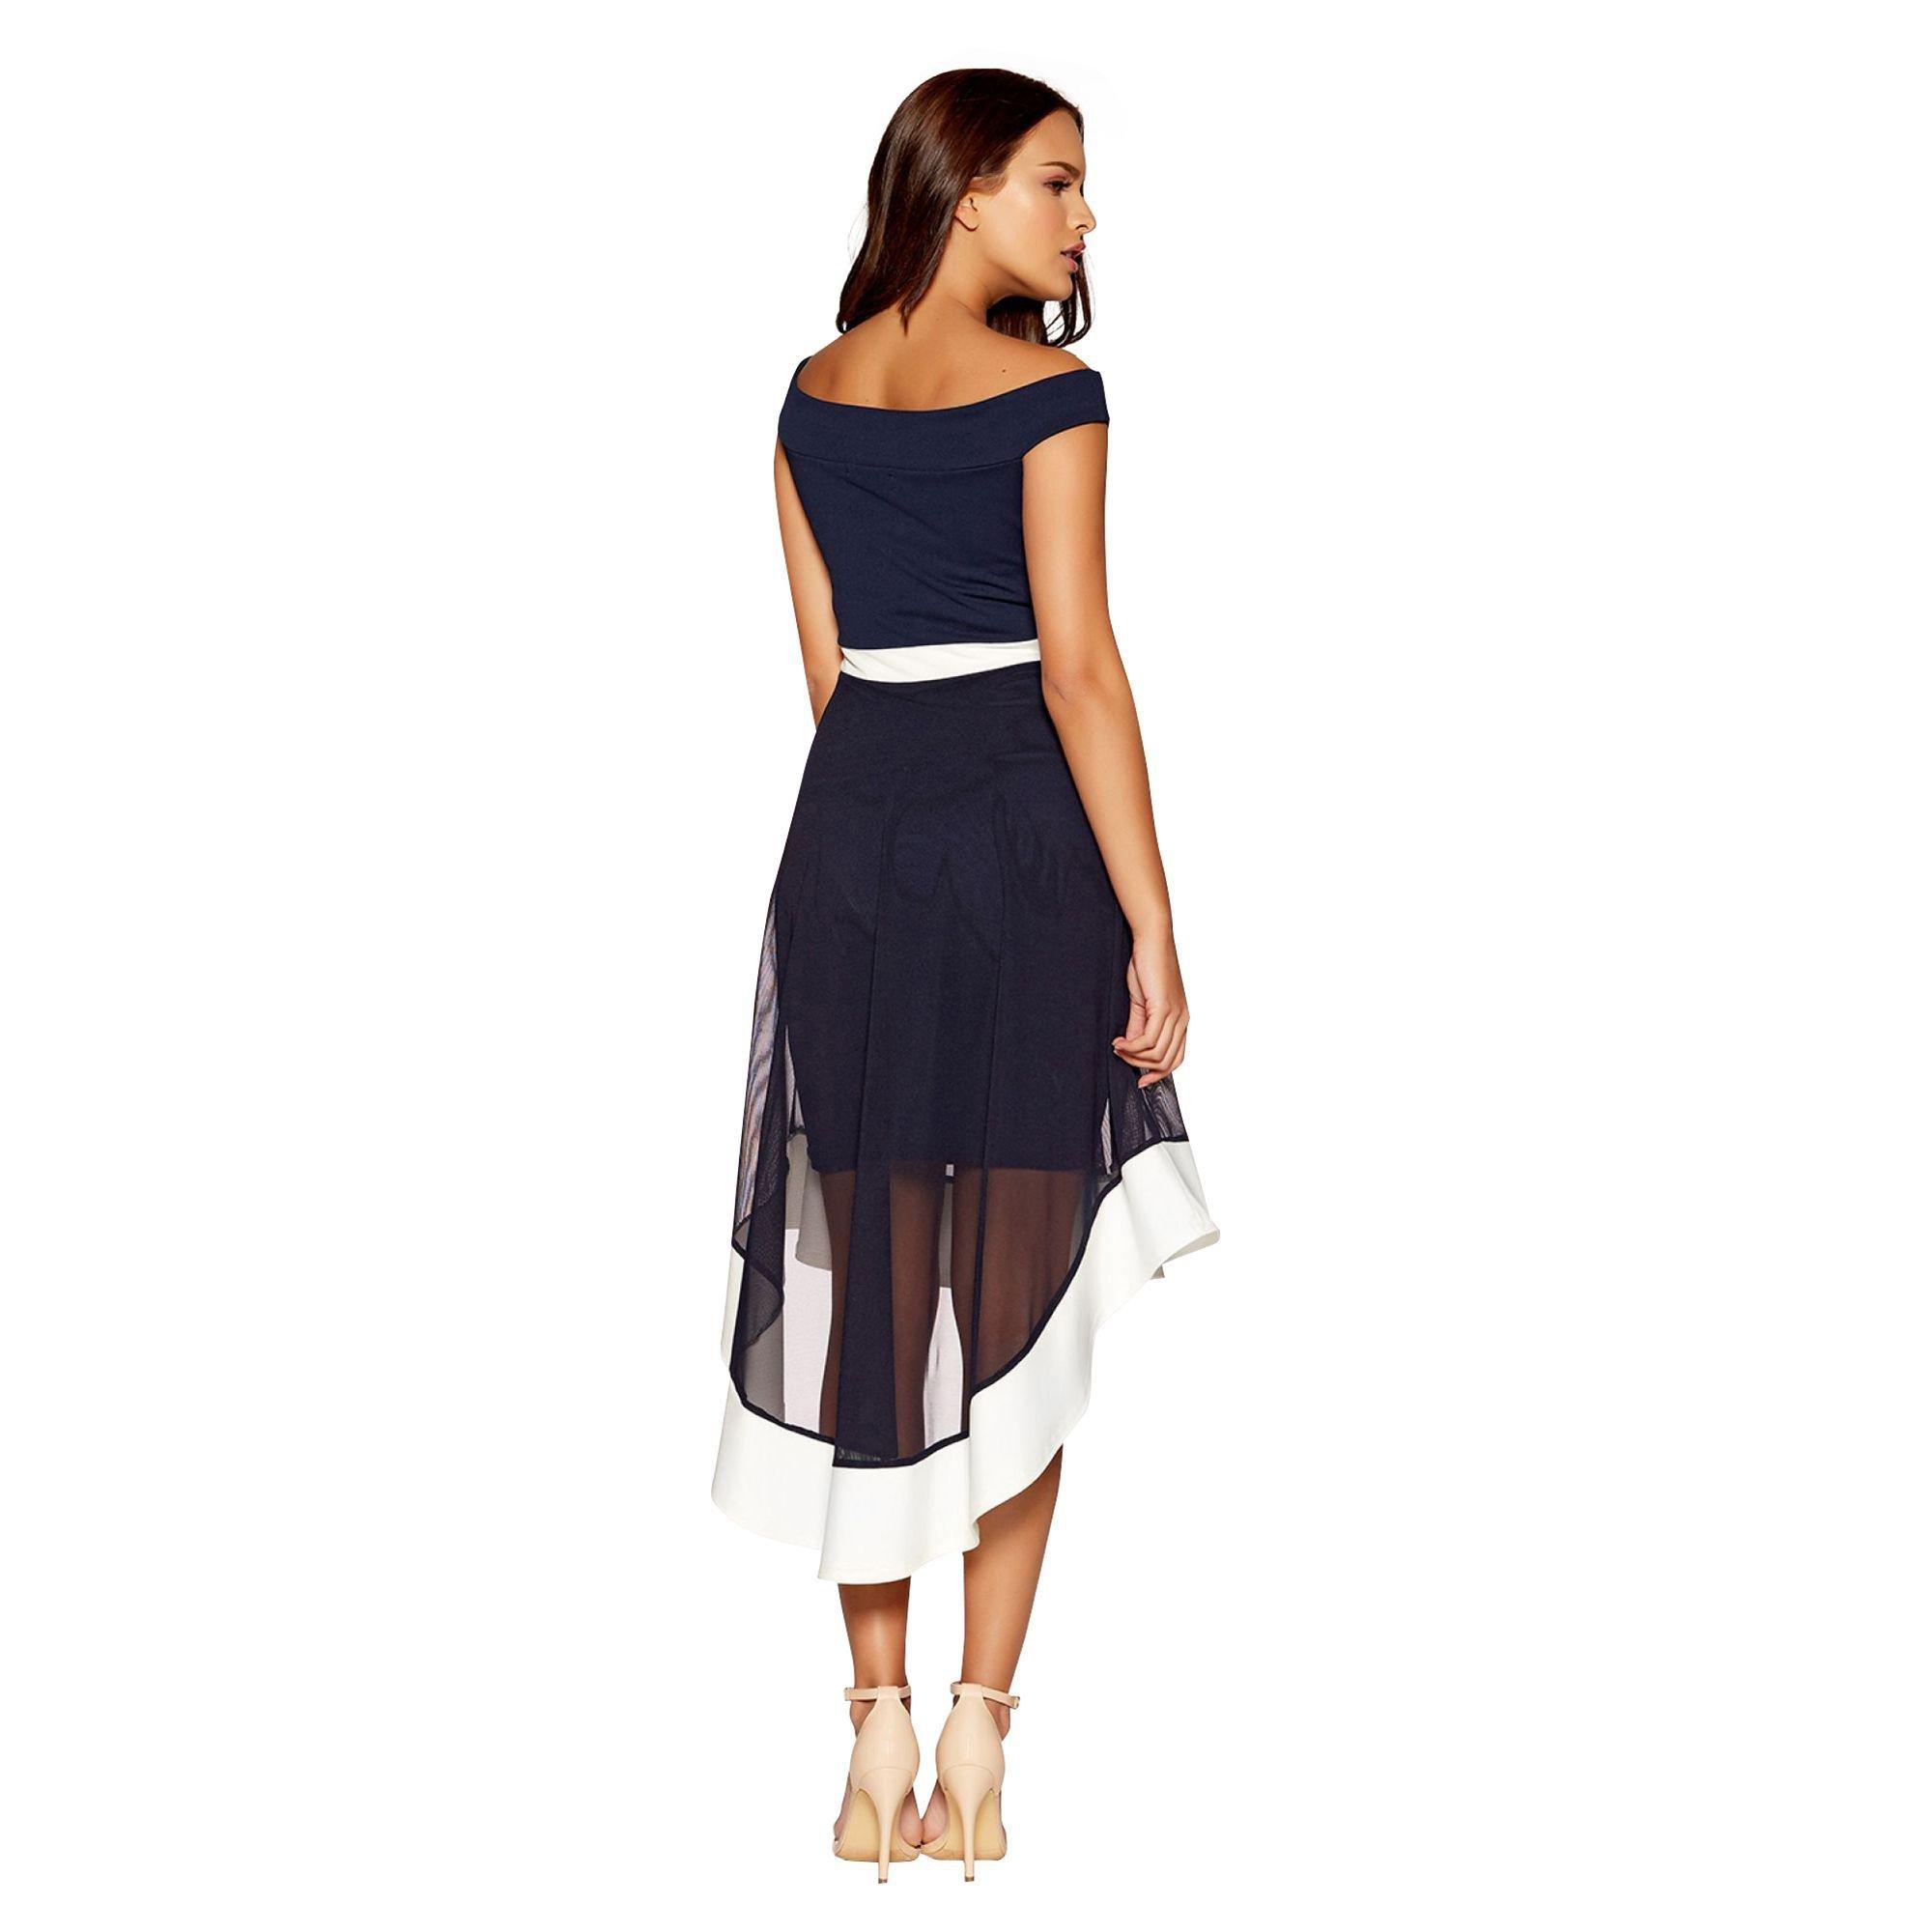 ... Navy And Cream Mesh Bardot Skater Dress - Lyst. View fullscreen 54d72c1f8